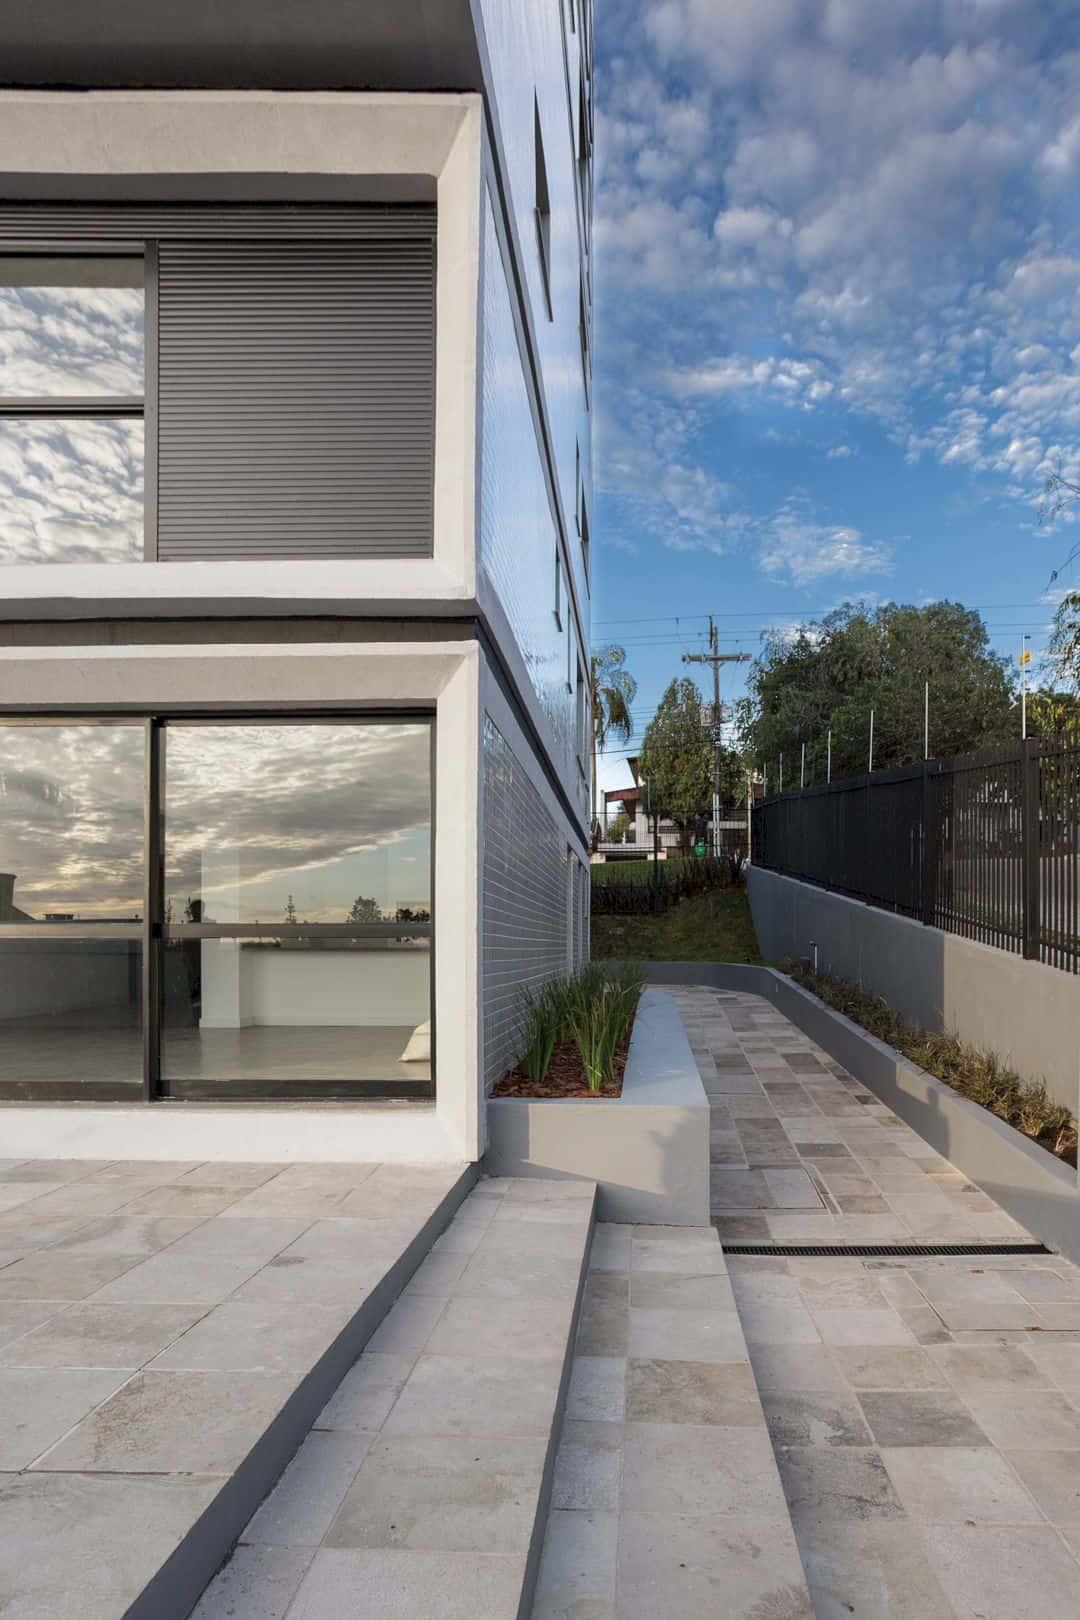 Fernando Abbott 866 A High Rise Residential Building In Porto Alegre 8